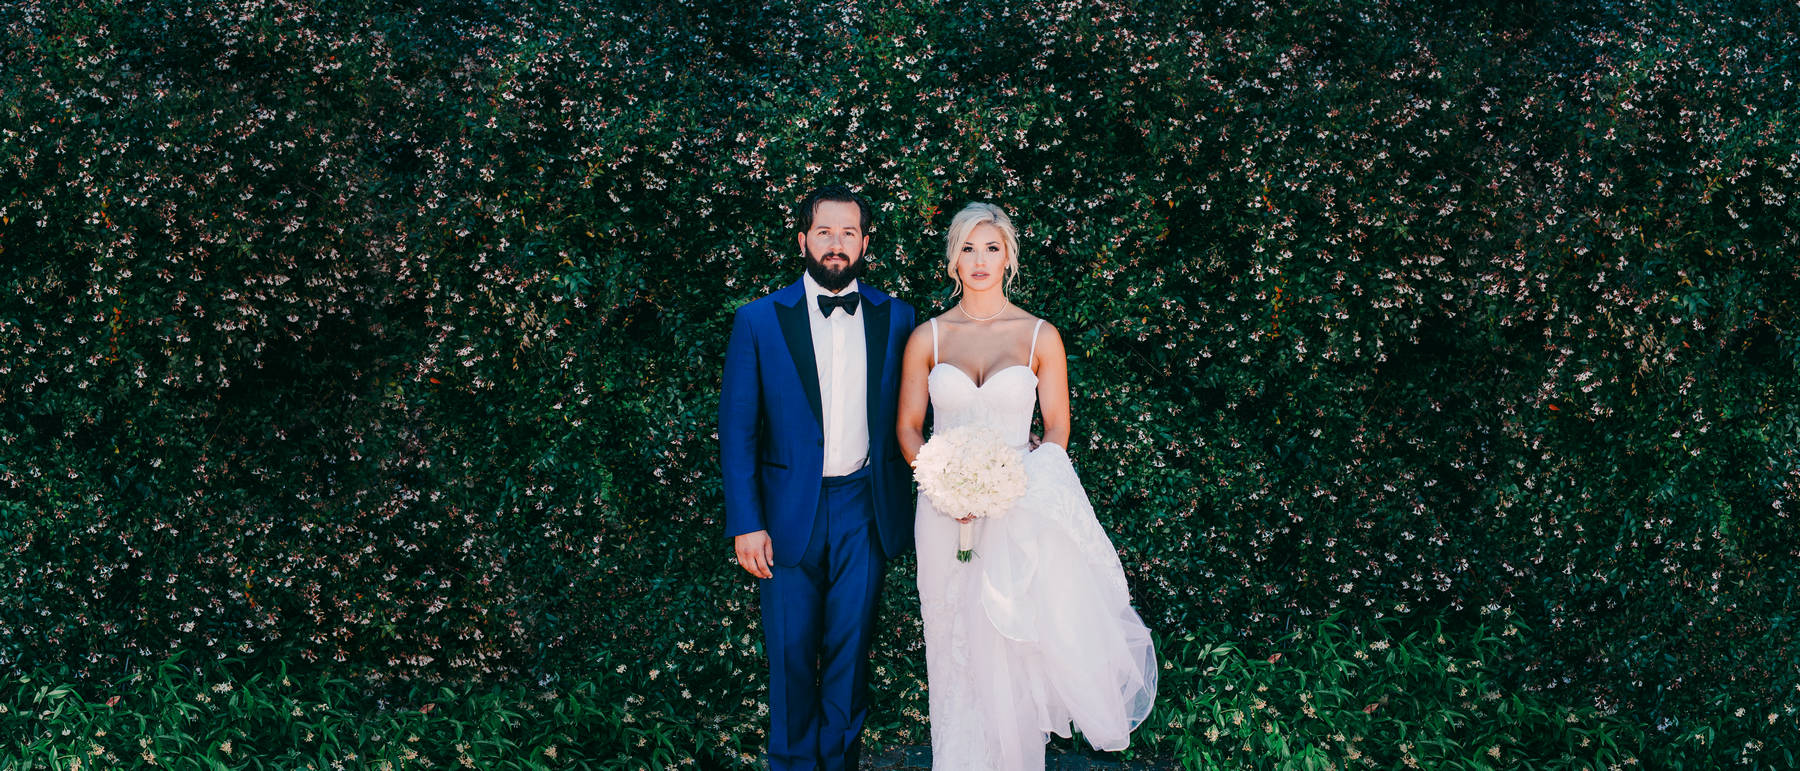 johnandjoseph-wedding-photographer-hz-slider-173